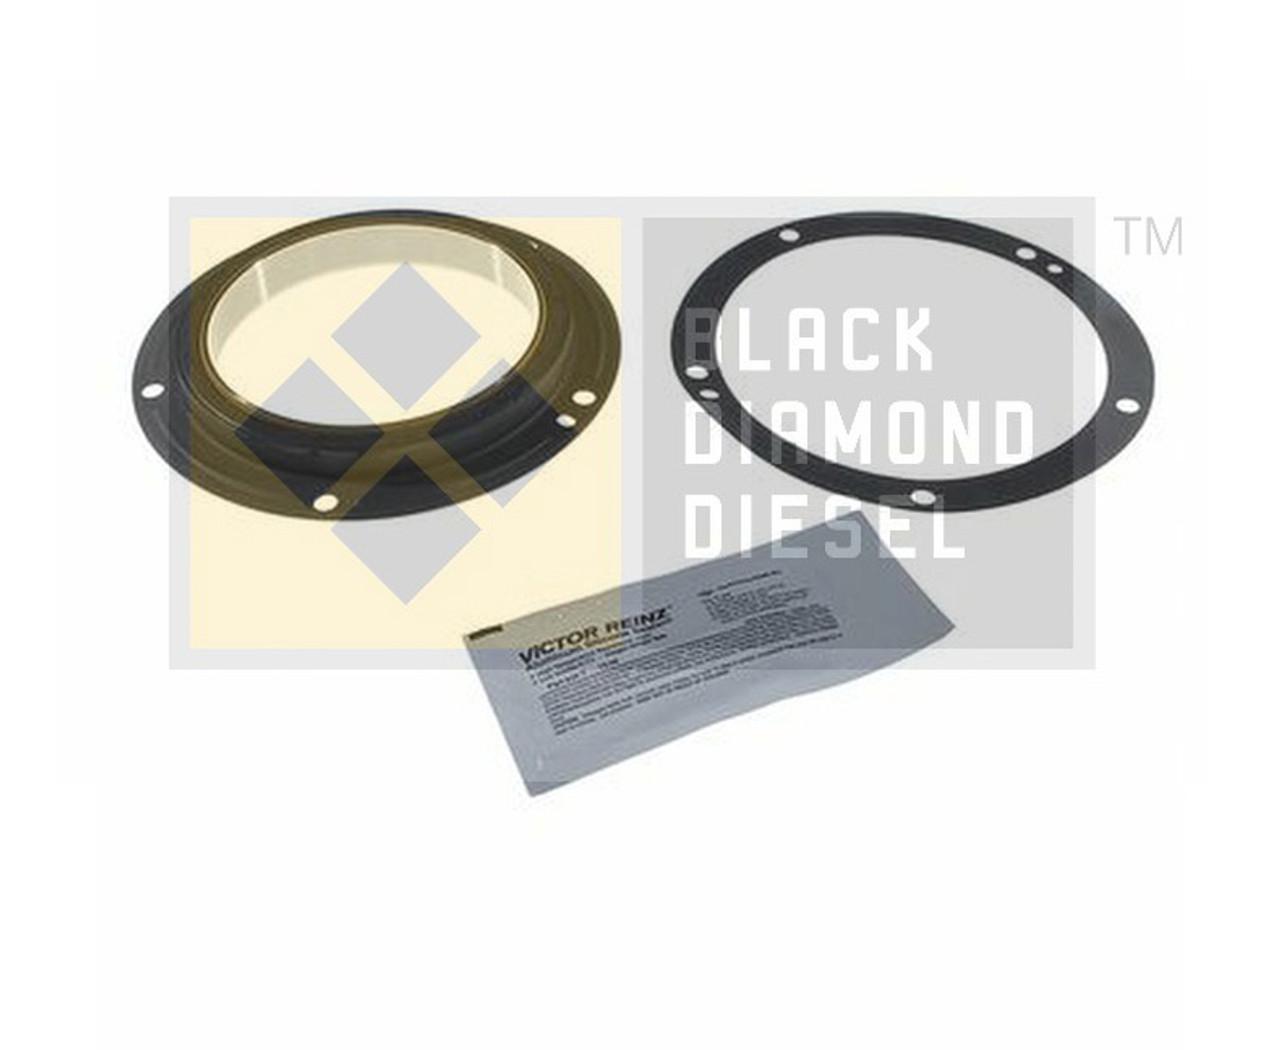 Black Diamond 94-07 Ford 7.3 Powerstroke Rear Main Seal